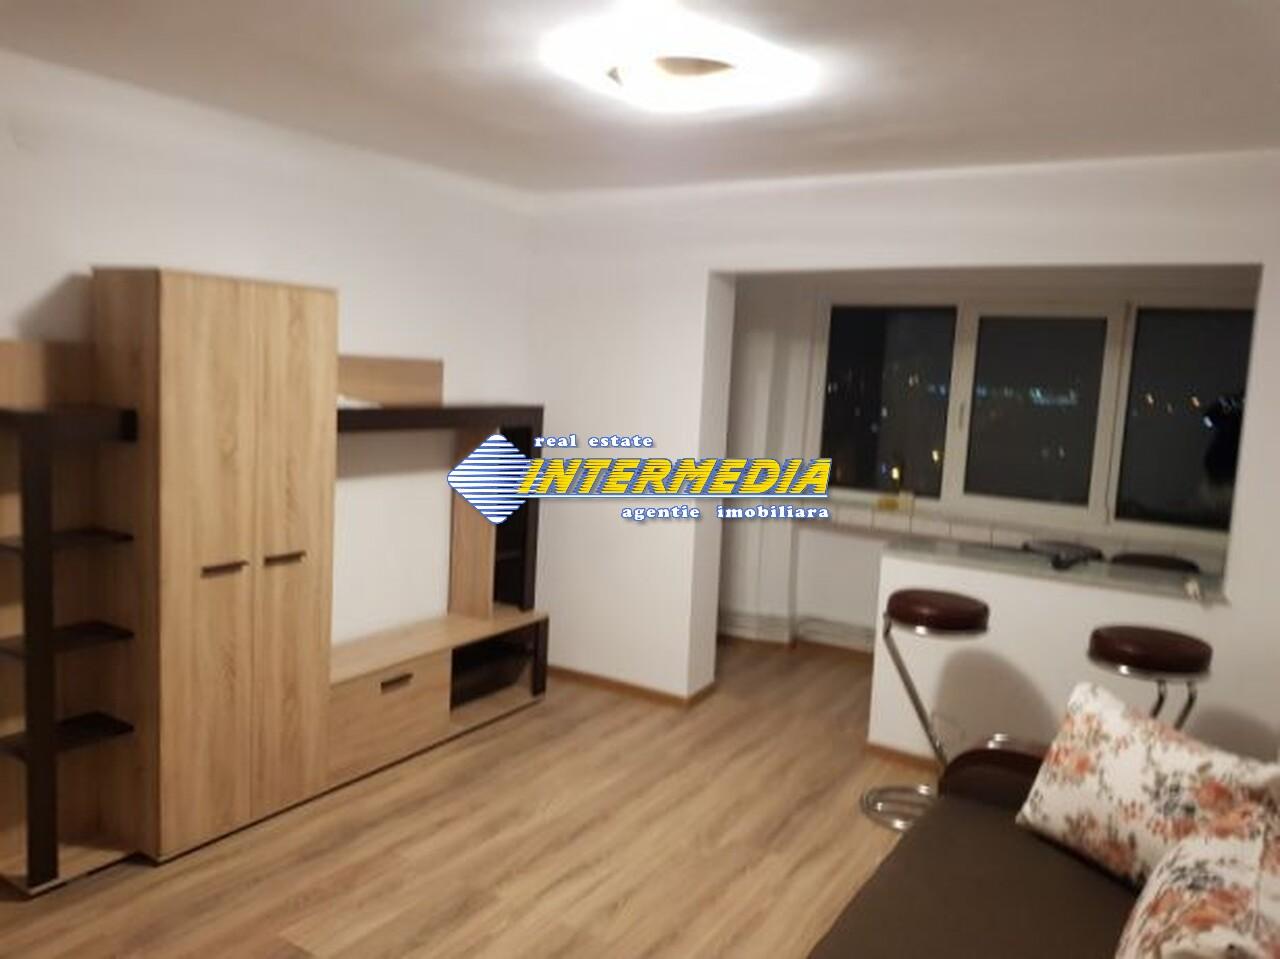 229245537_6_644x461_apartament-2-camere-2-balcoane-bloc-m-_rev016.jpg